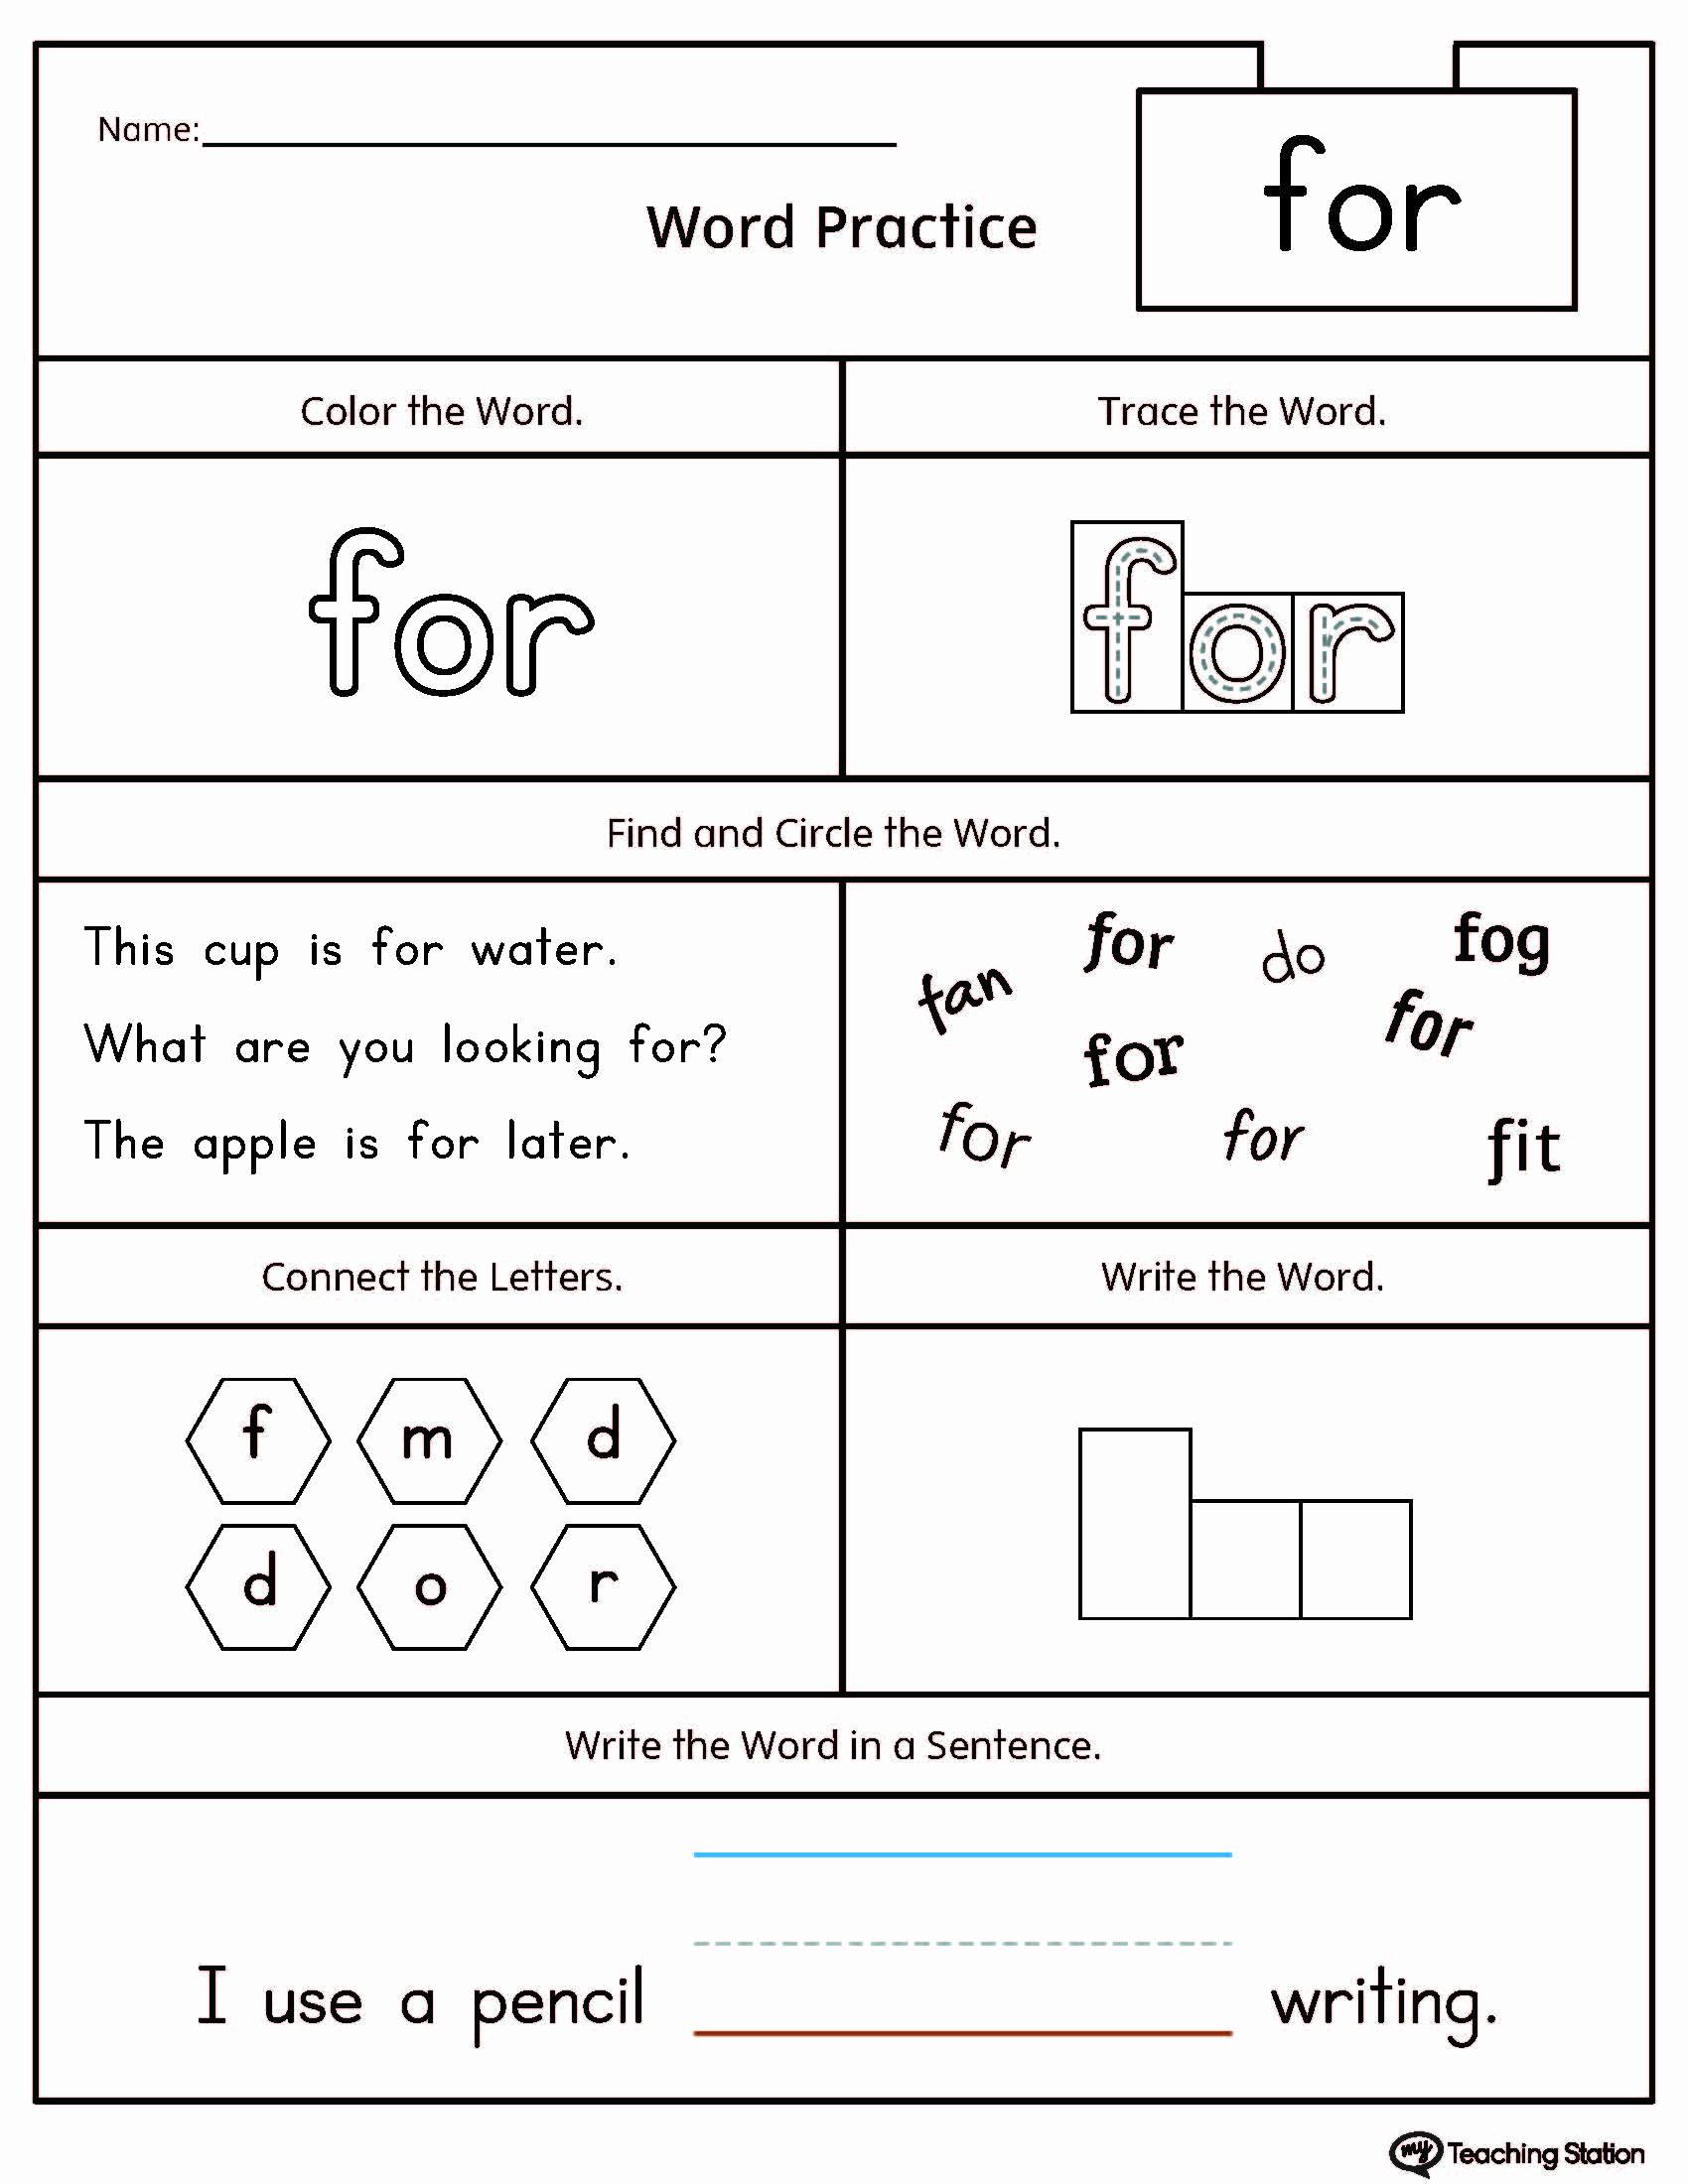 Positional Words Preschool Worksheets Fresh 20 Positional Words Preschool Worksheets